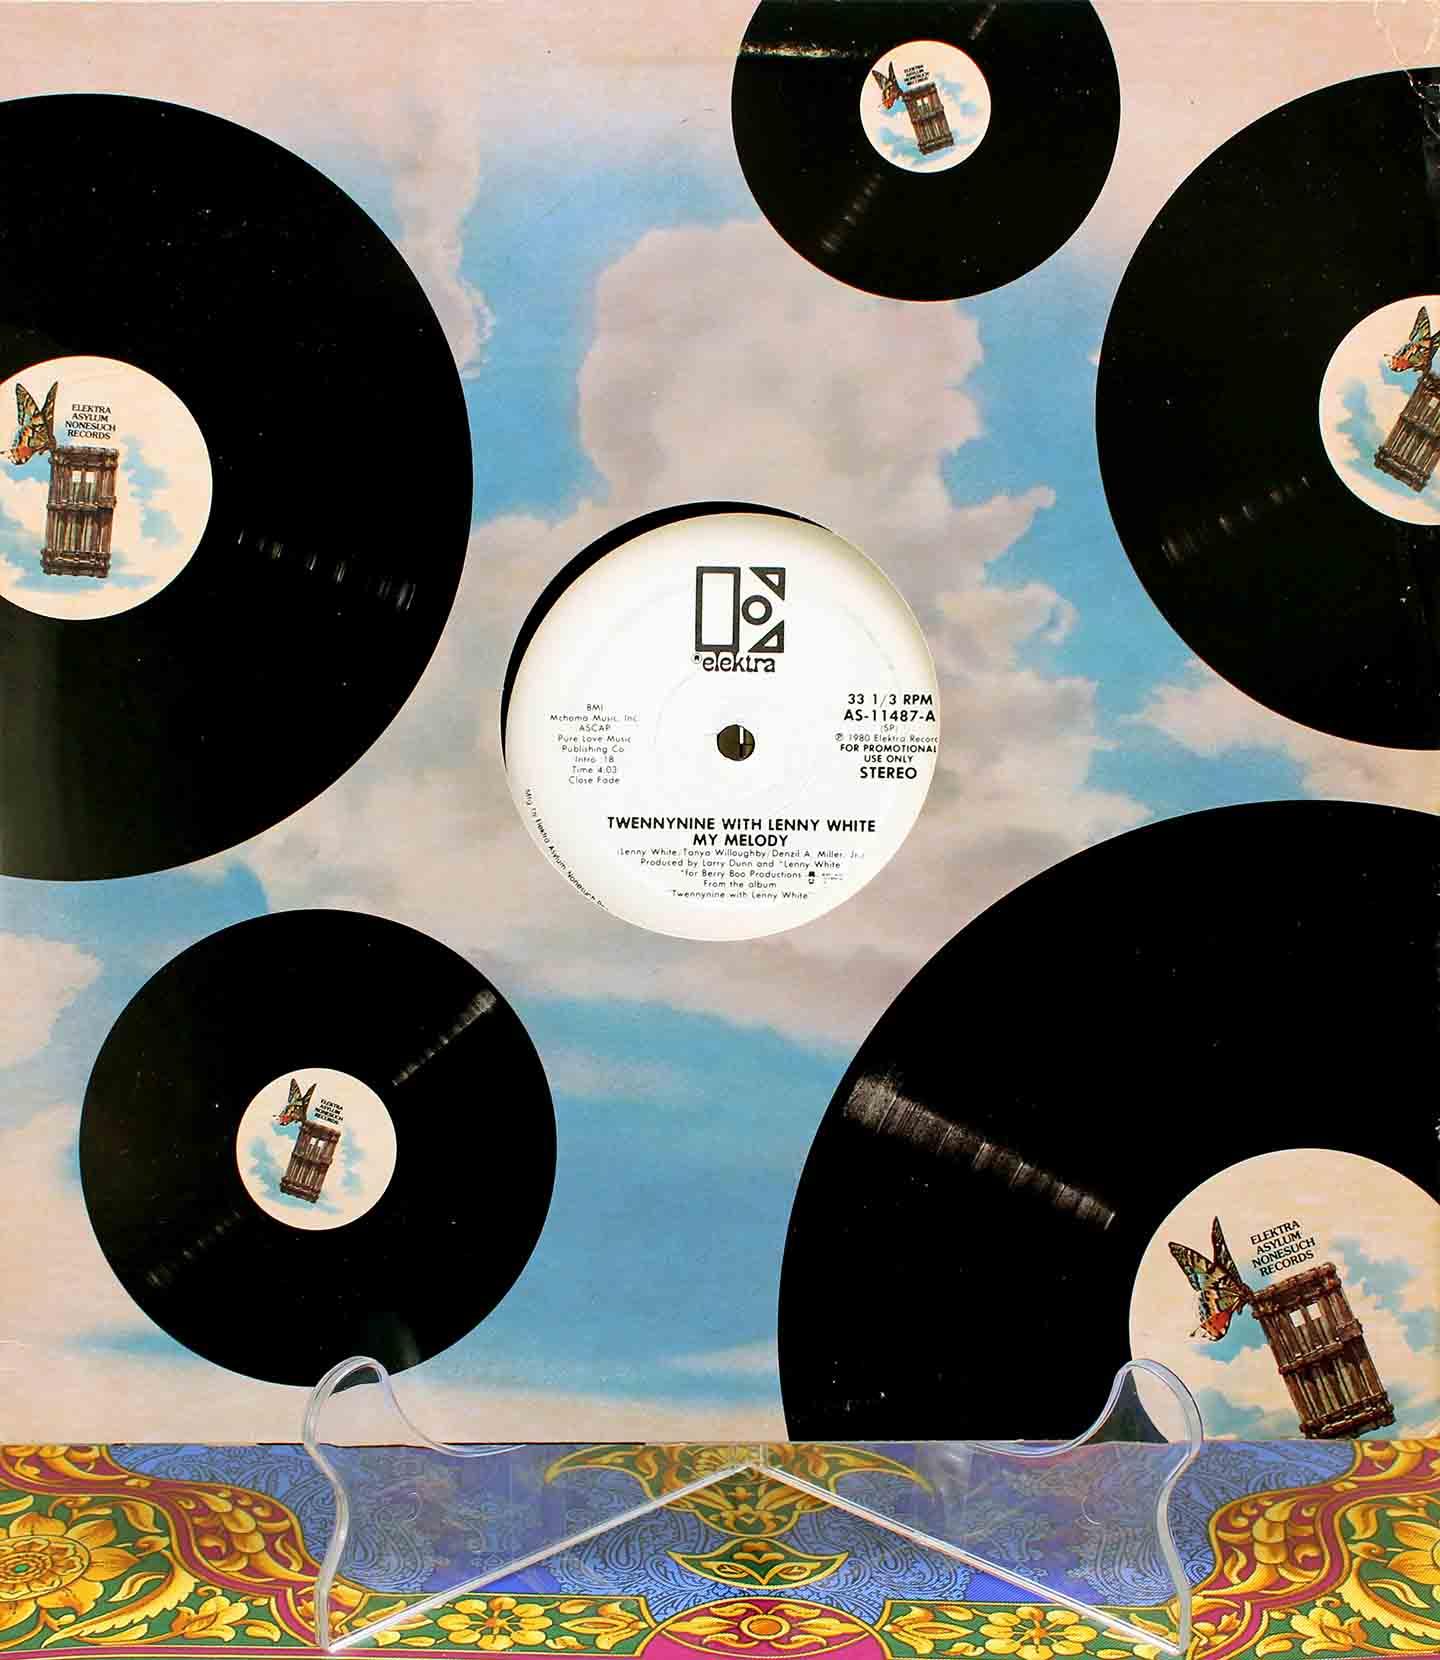 Twennynine With Lenny White – My Melody 01